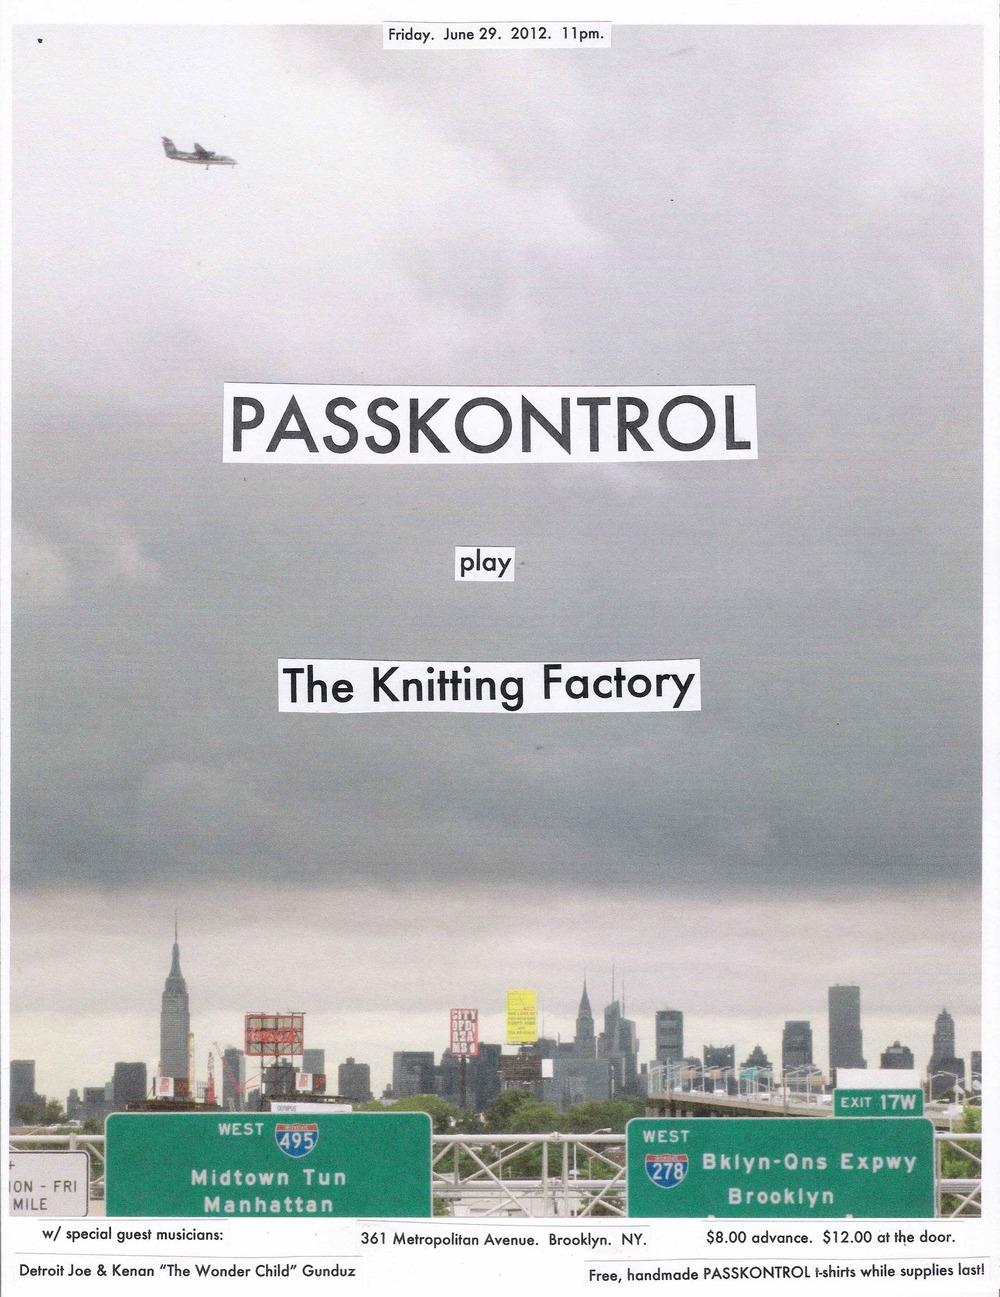 passkontrol_knittingfactory_6_29_12_website.jpg